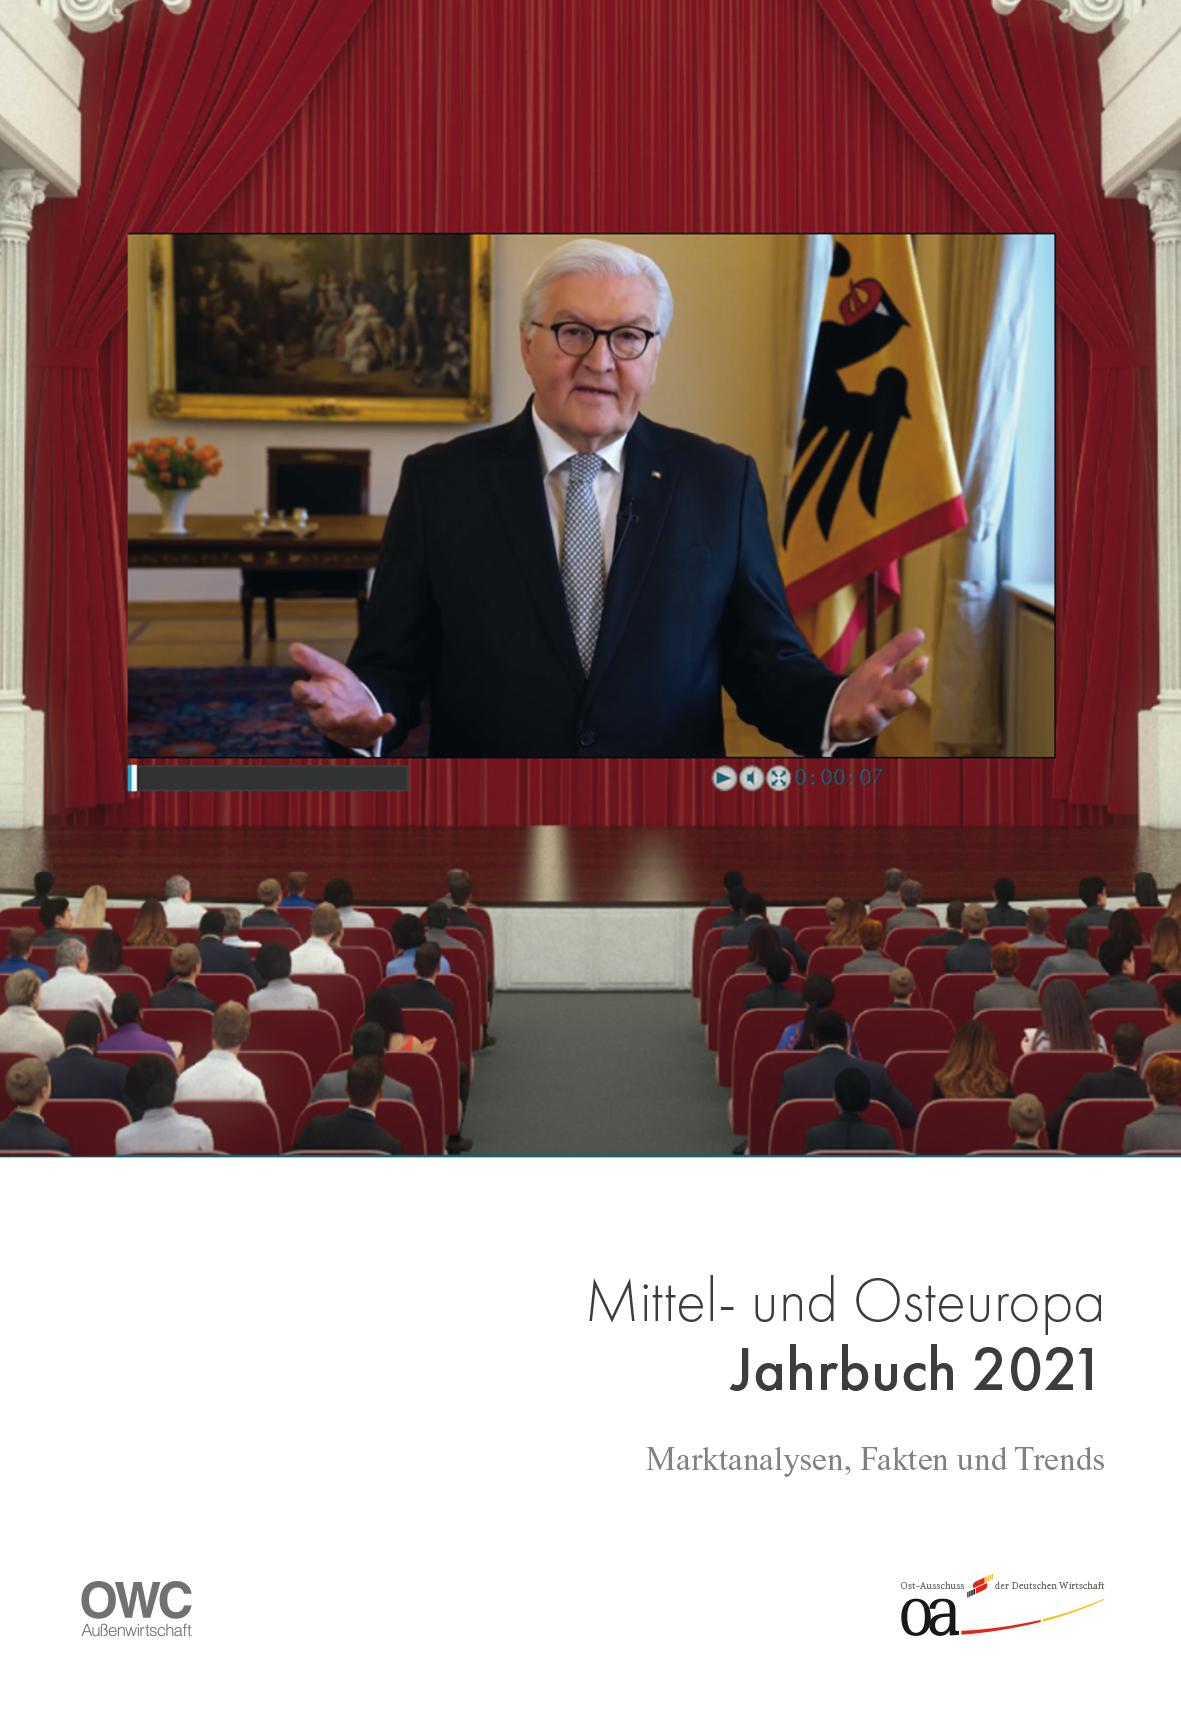 https://owc.de/wp-content/uploads/2021/06/MOE-JB-2021_cover.jpg